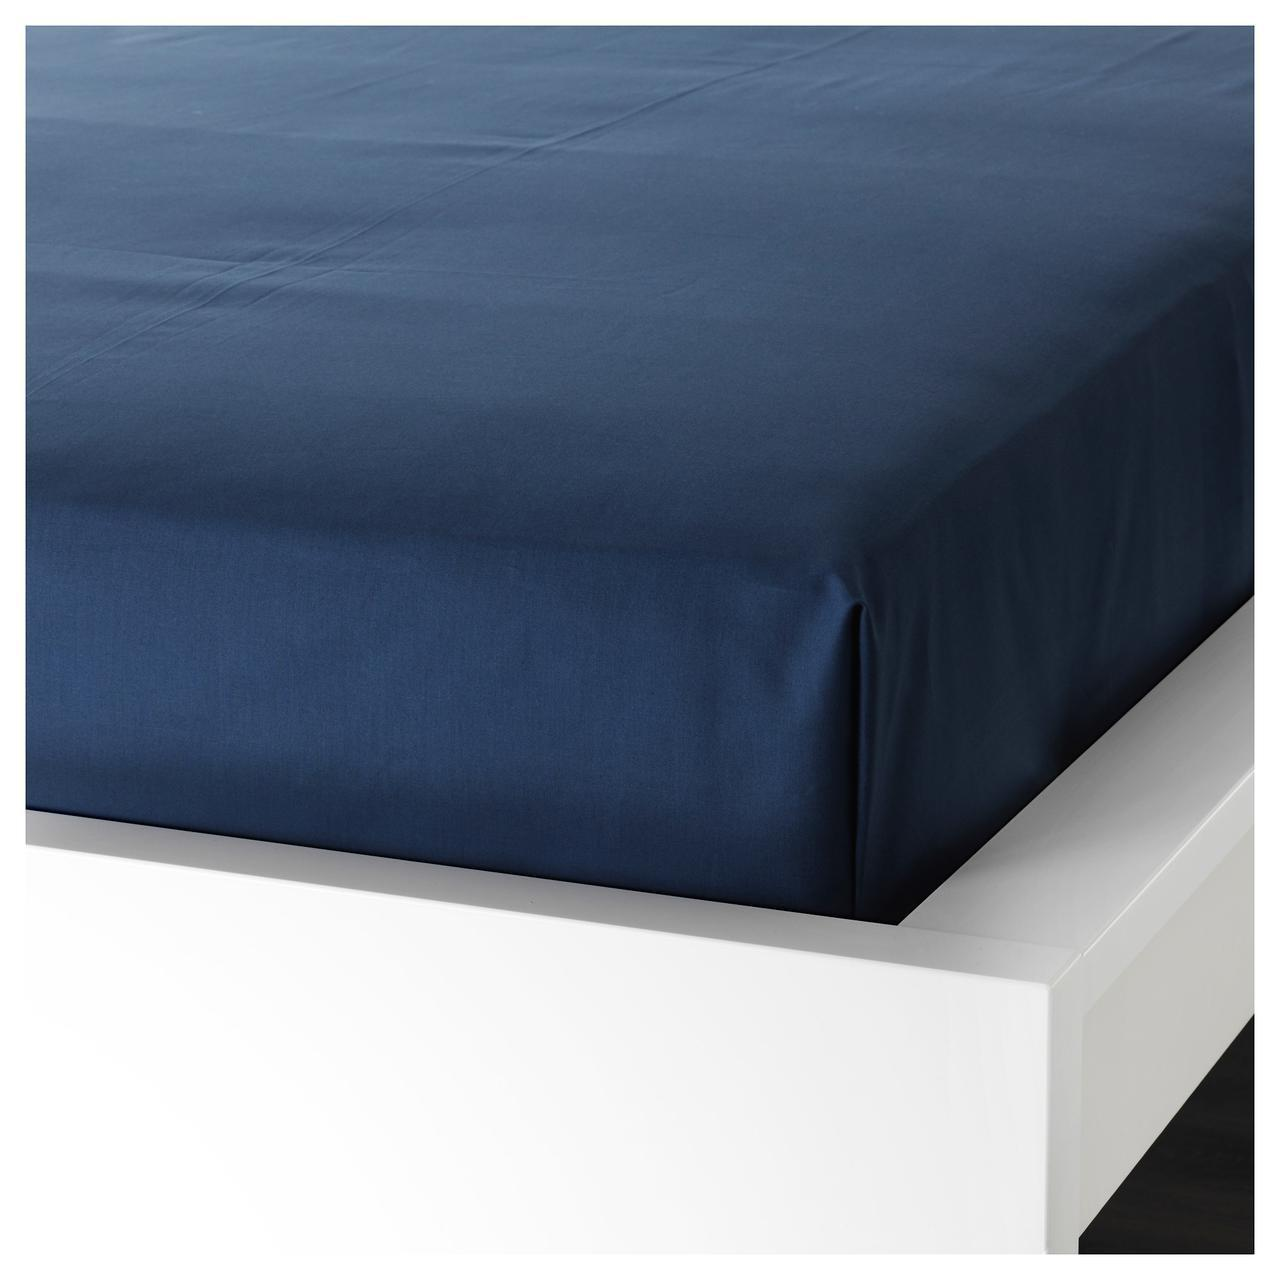 Простыня IKEA ULLVIDE 240х260 см темно-синяя 703.428.06